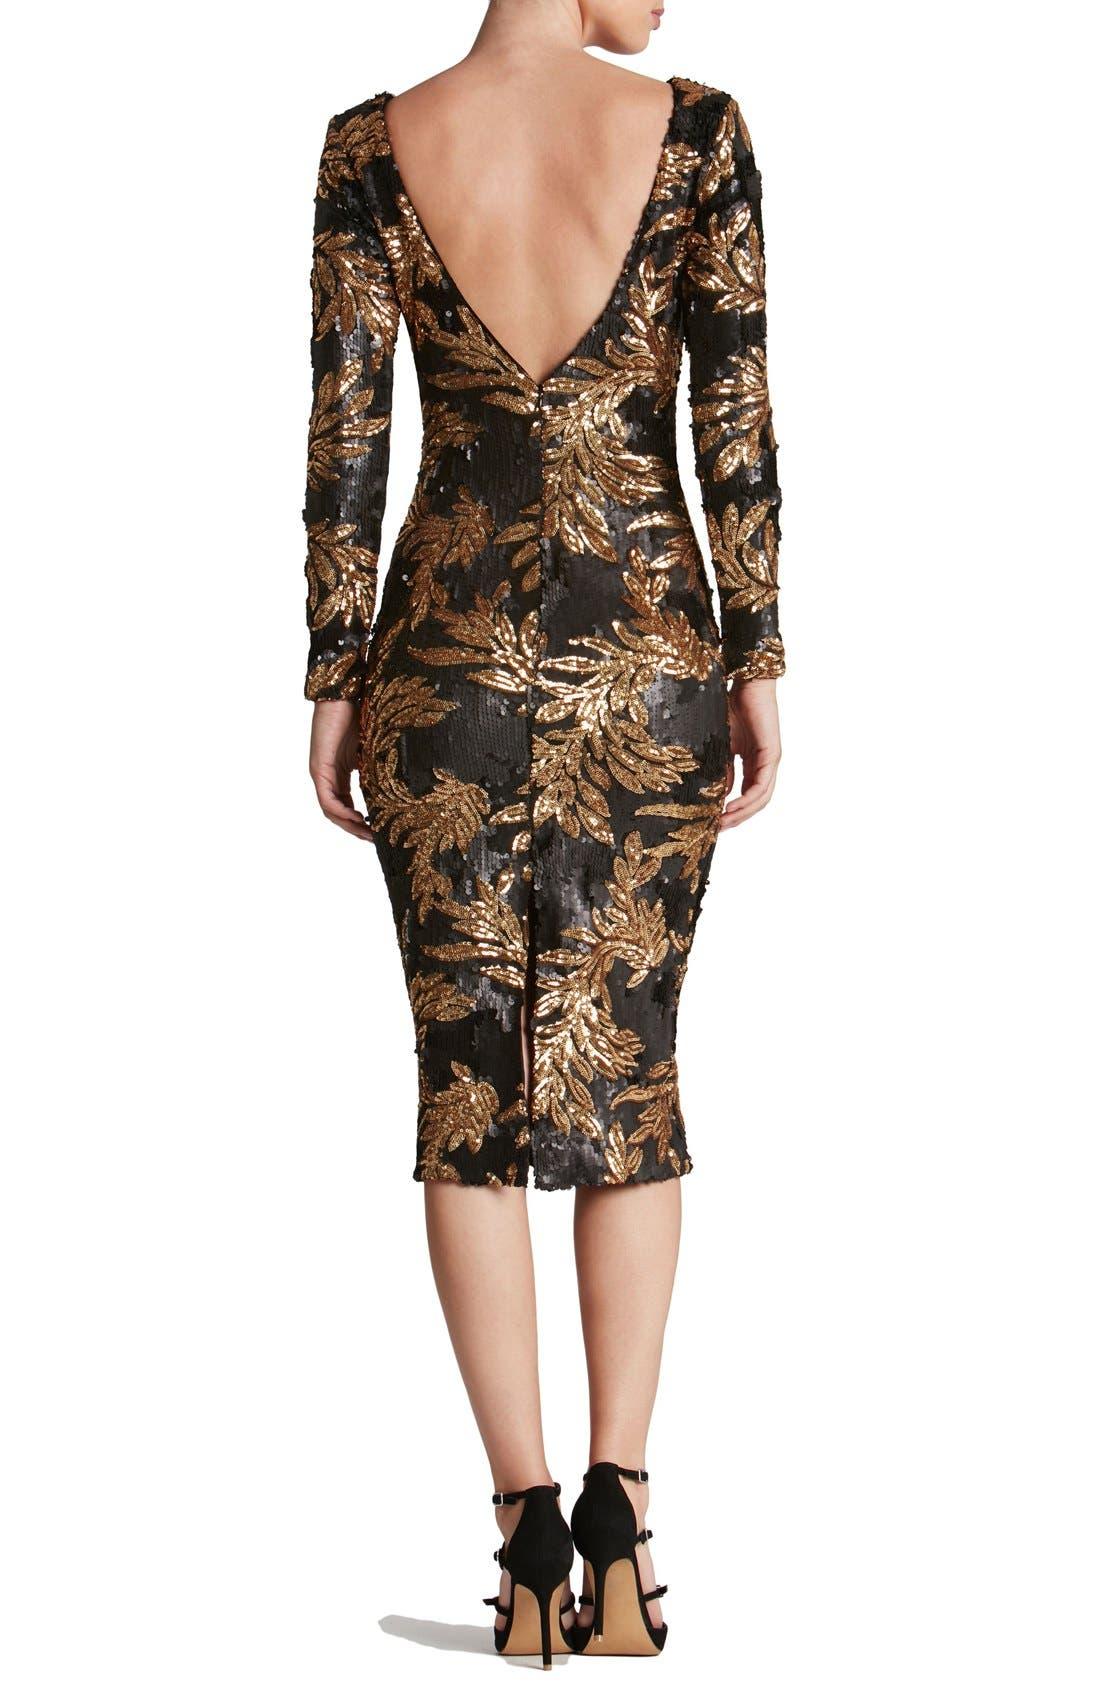 Alternate Image 2  - Dress the Population 'Emery' Scoop Back Two-Tone Sequin Sheath Dress